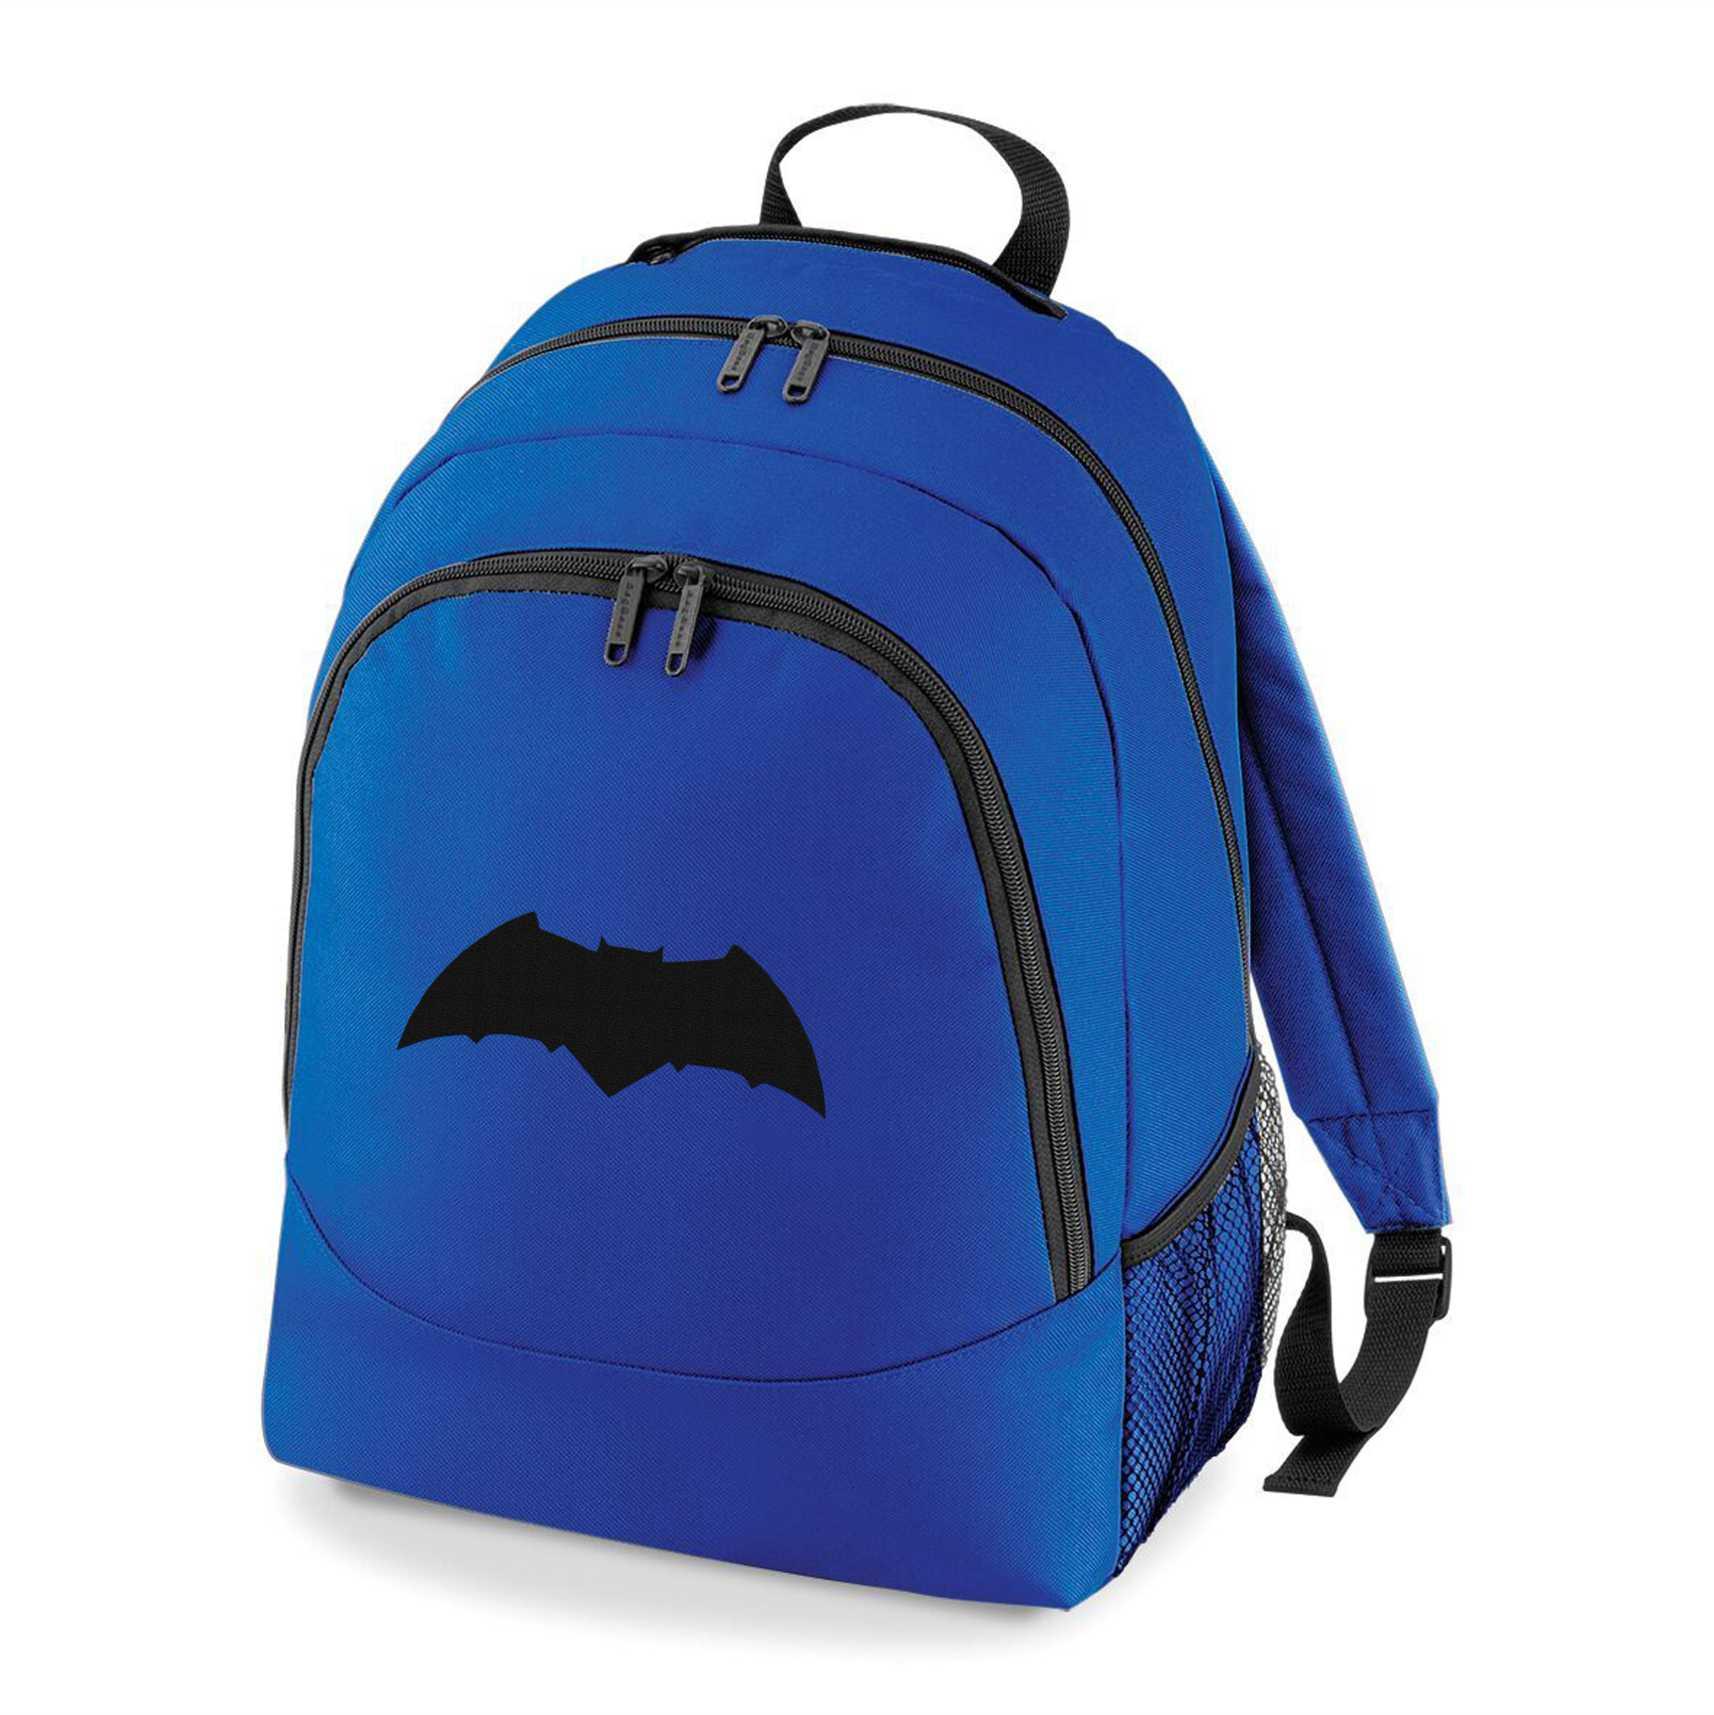 The New Bat Rucksack Bag